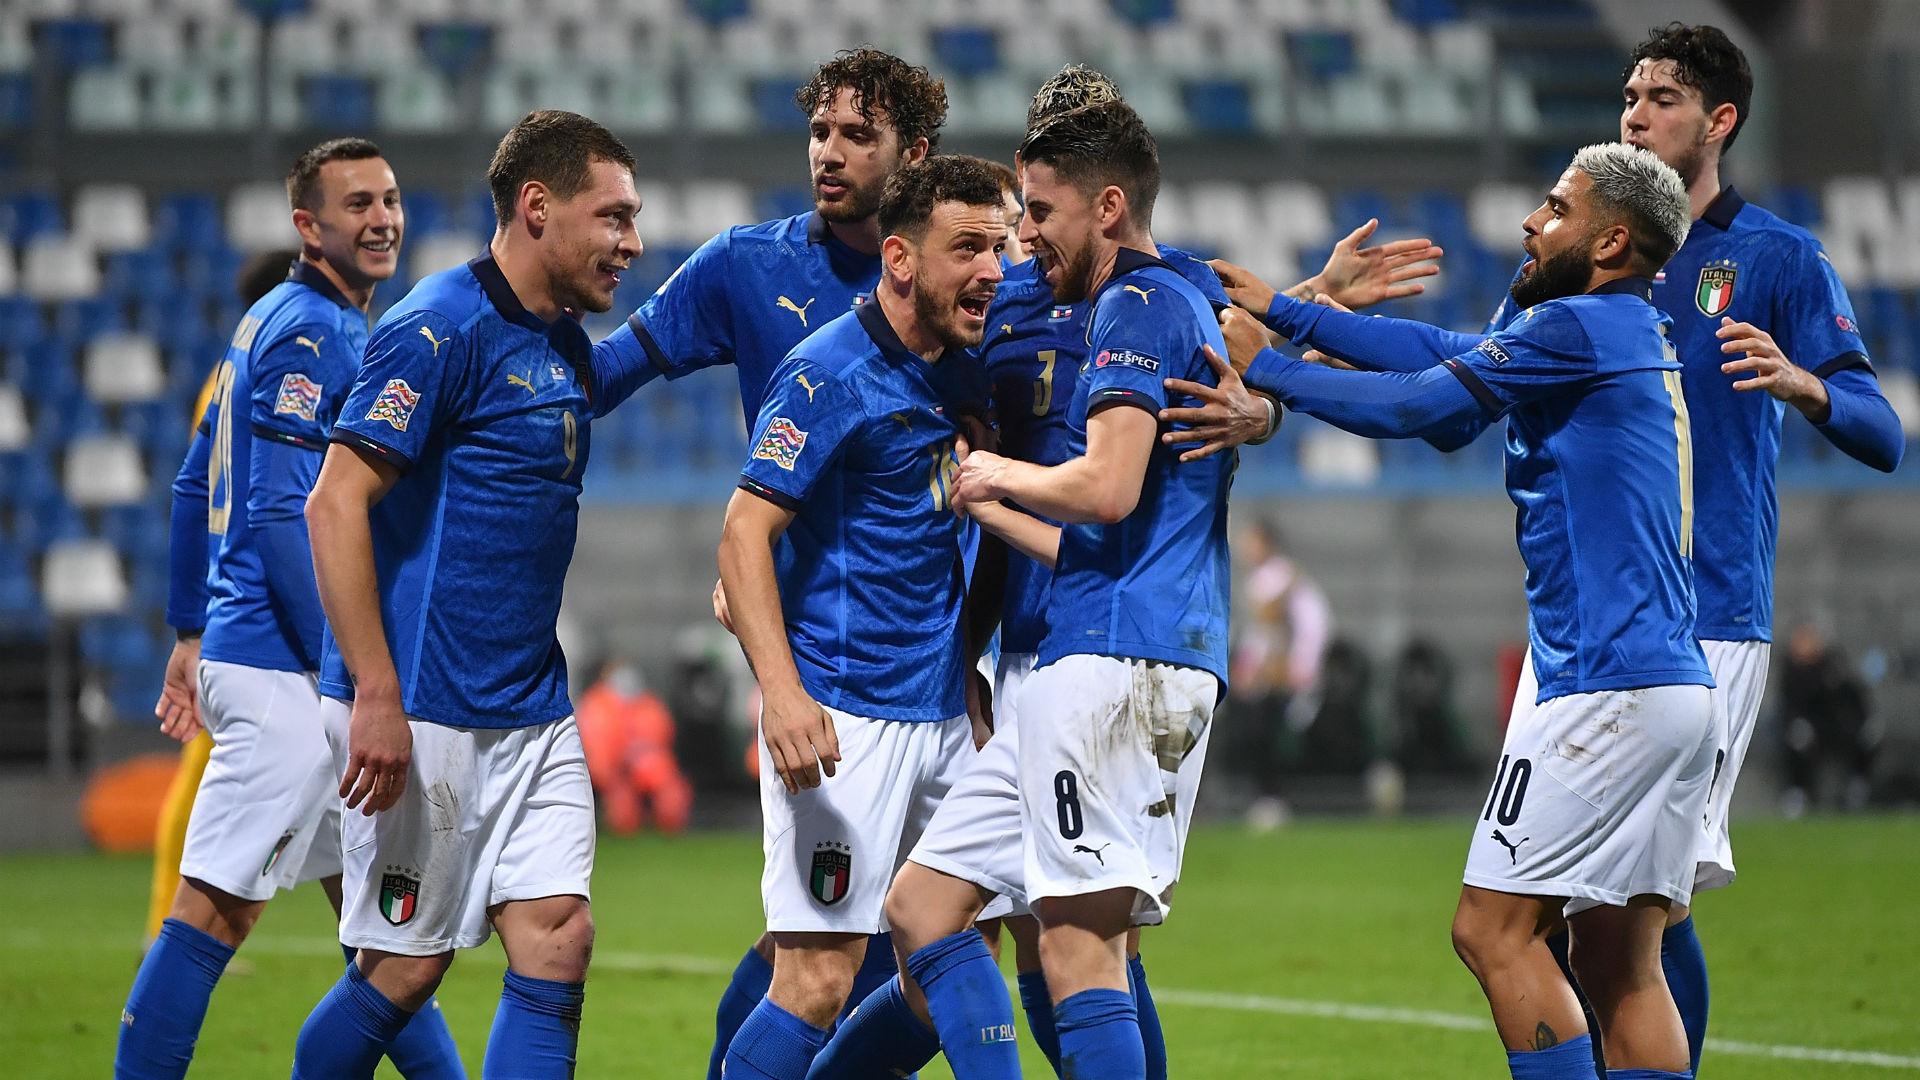 Italy 2-0 Poland: Jorginho and Berardi put dominant Azzurri on top